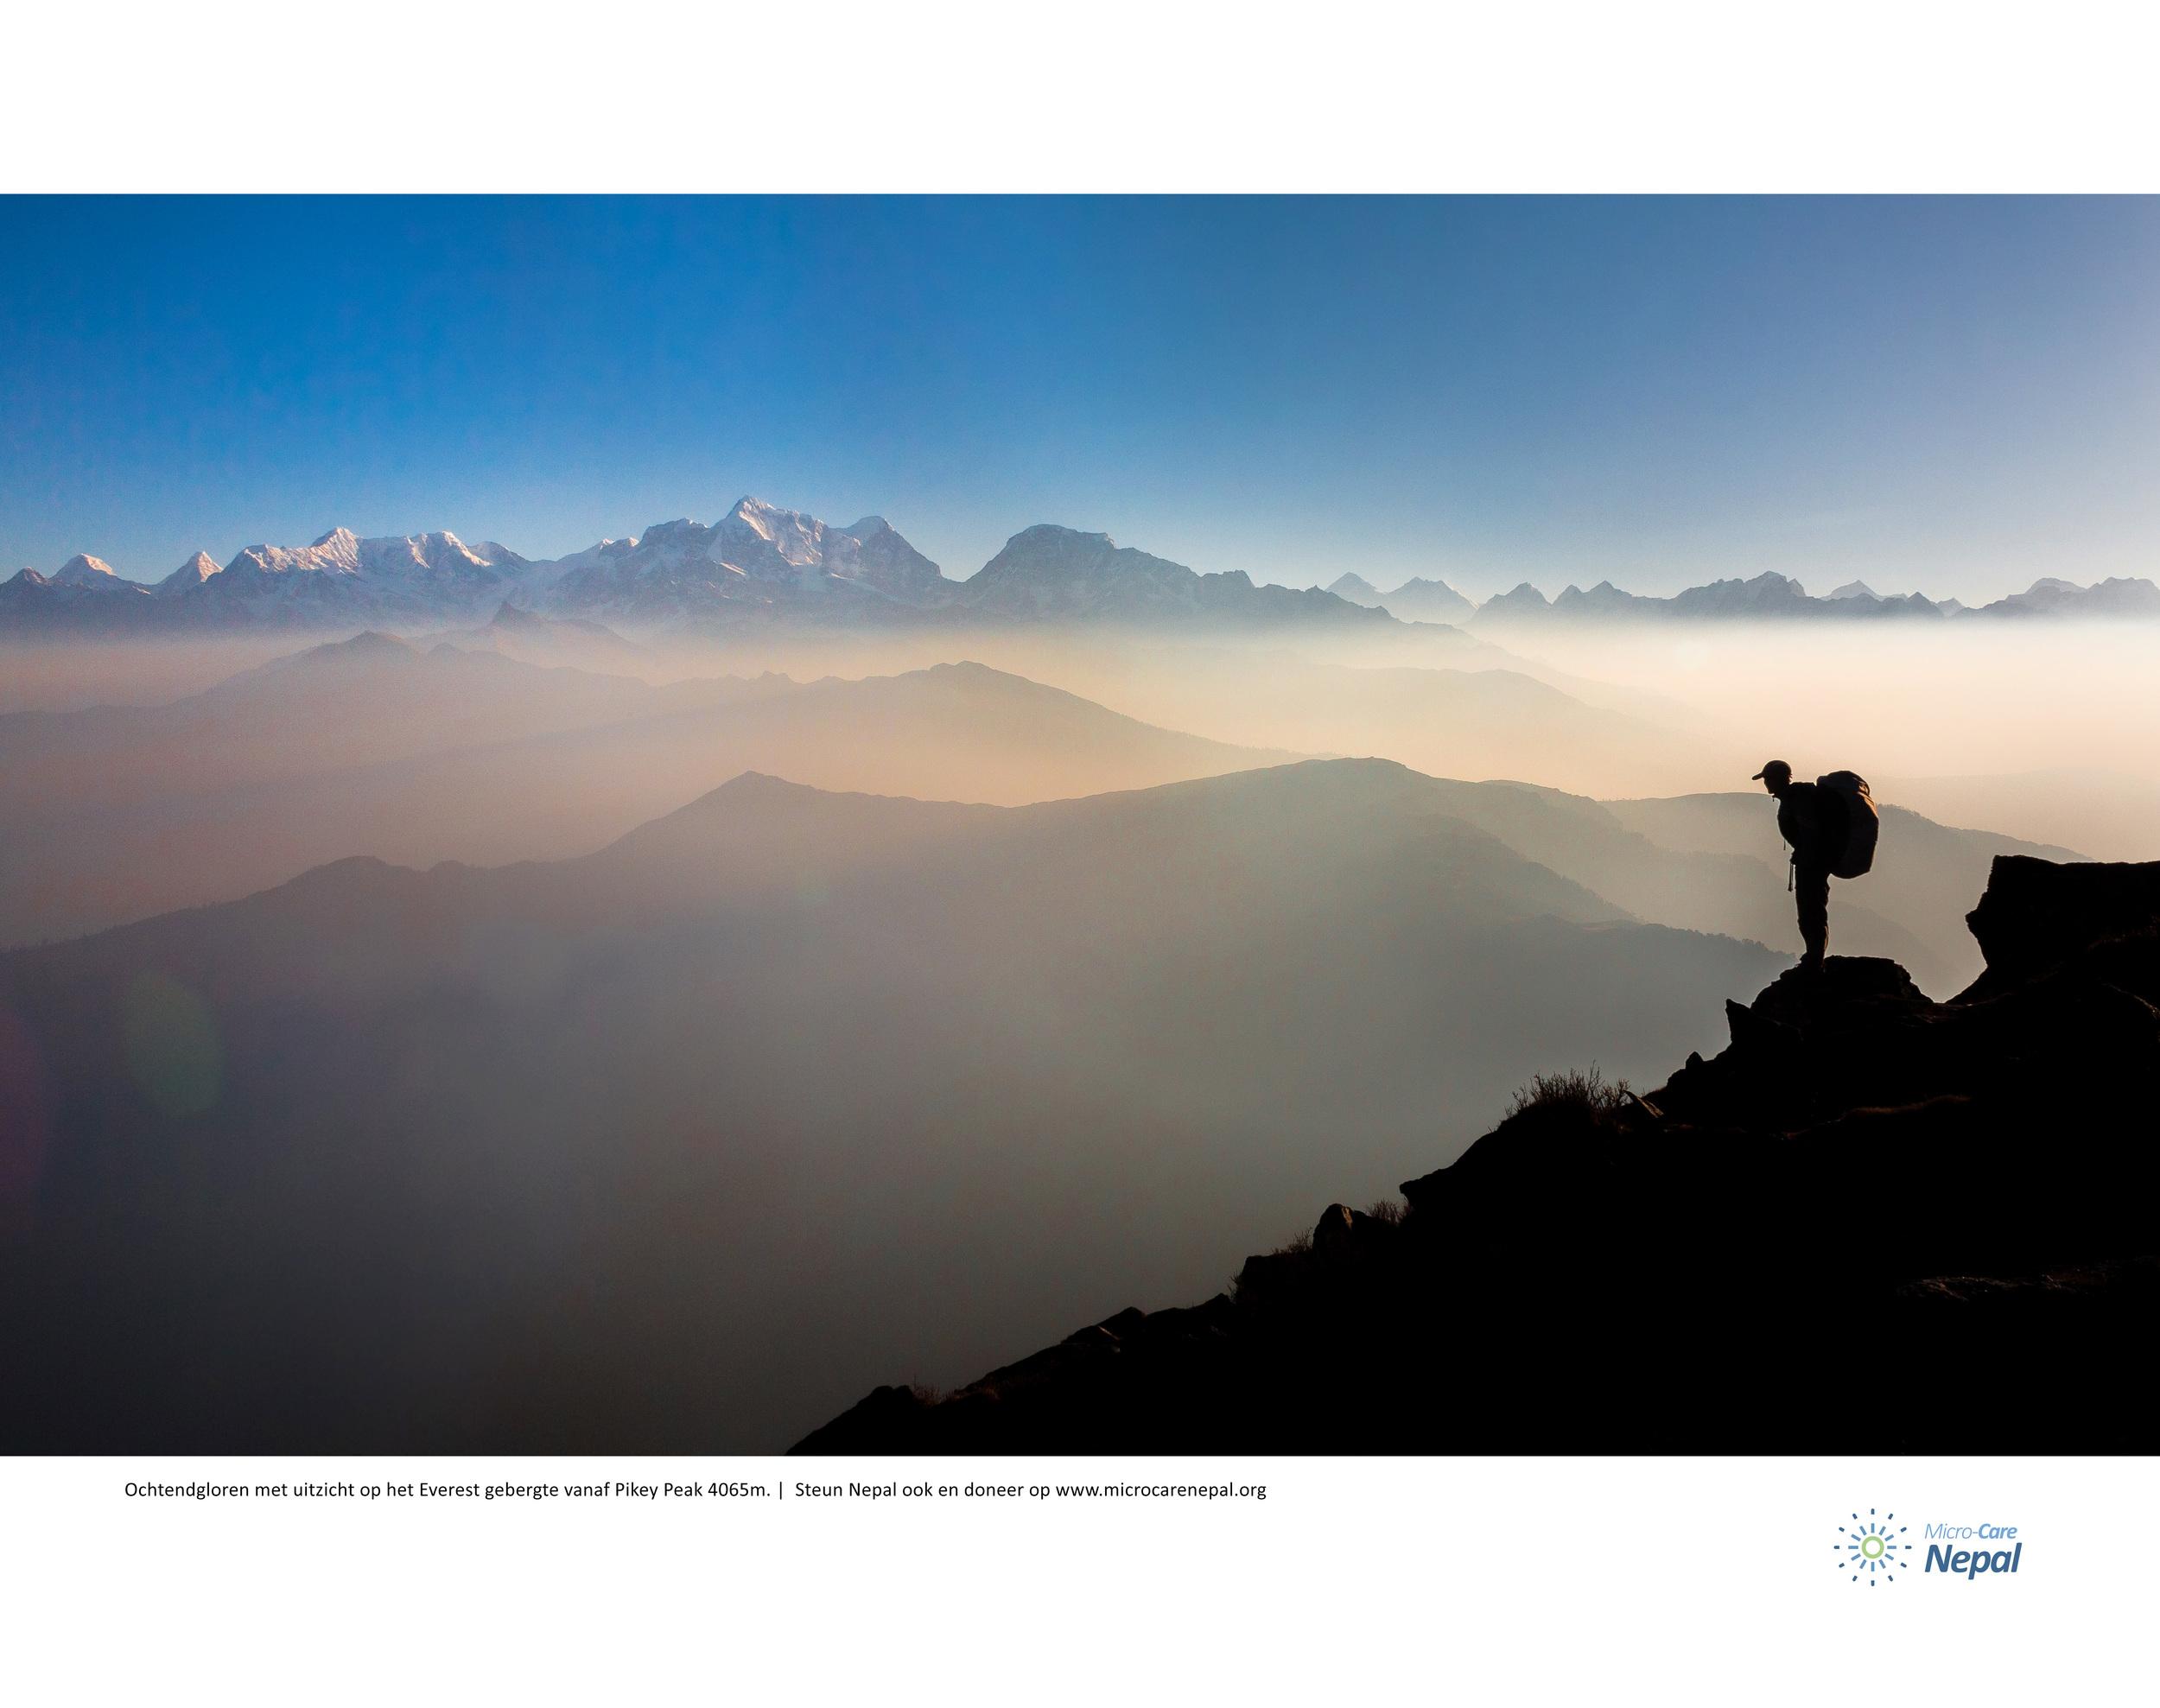 2016-03--MOUNTAIN-OF-NEPAL.jpg